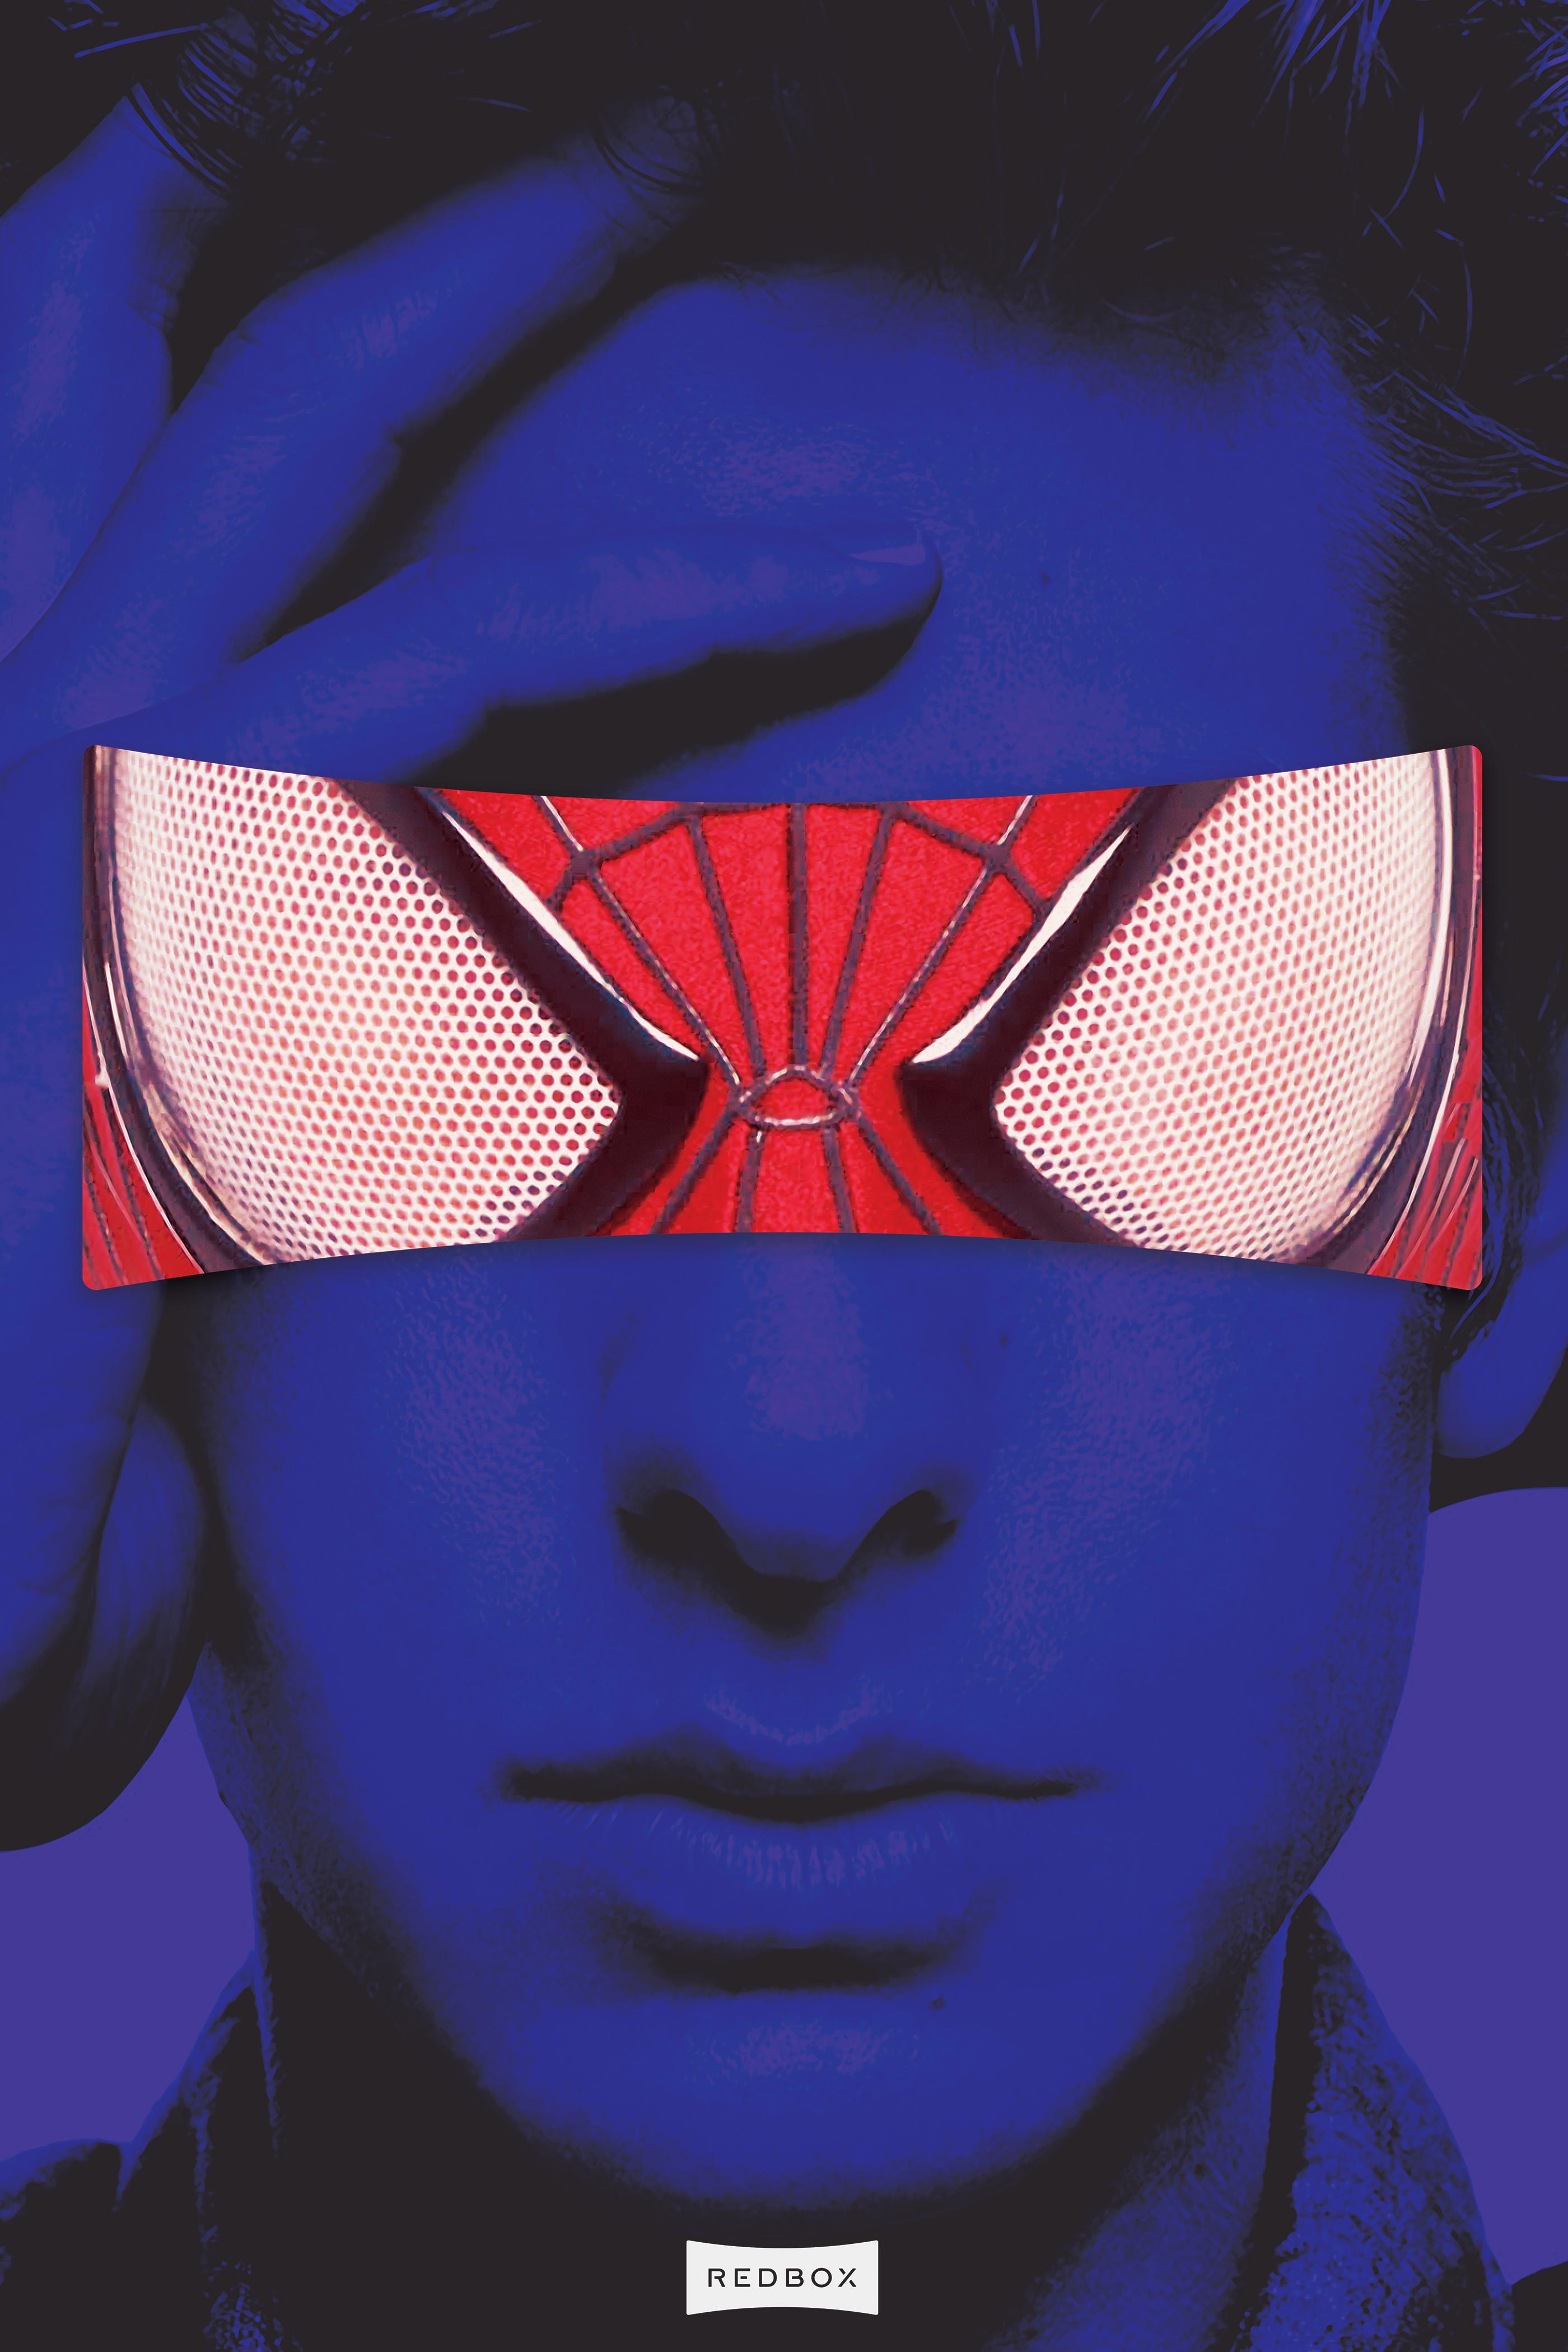 Redbox_Spiderman_Poster_24x36_vFSMALL